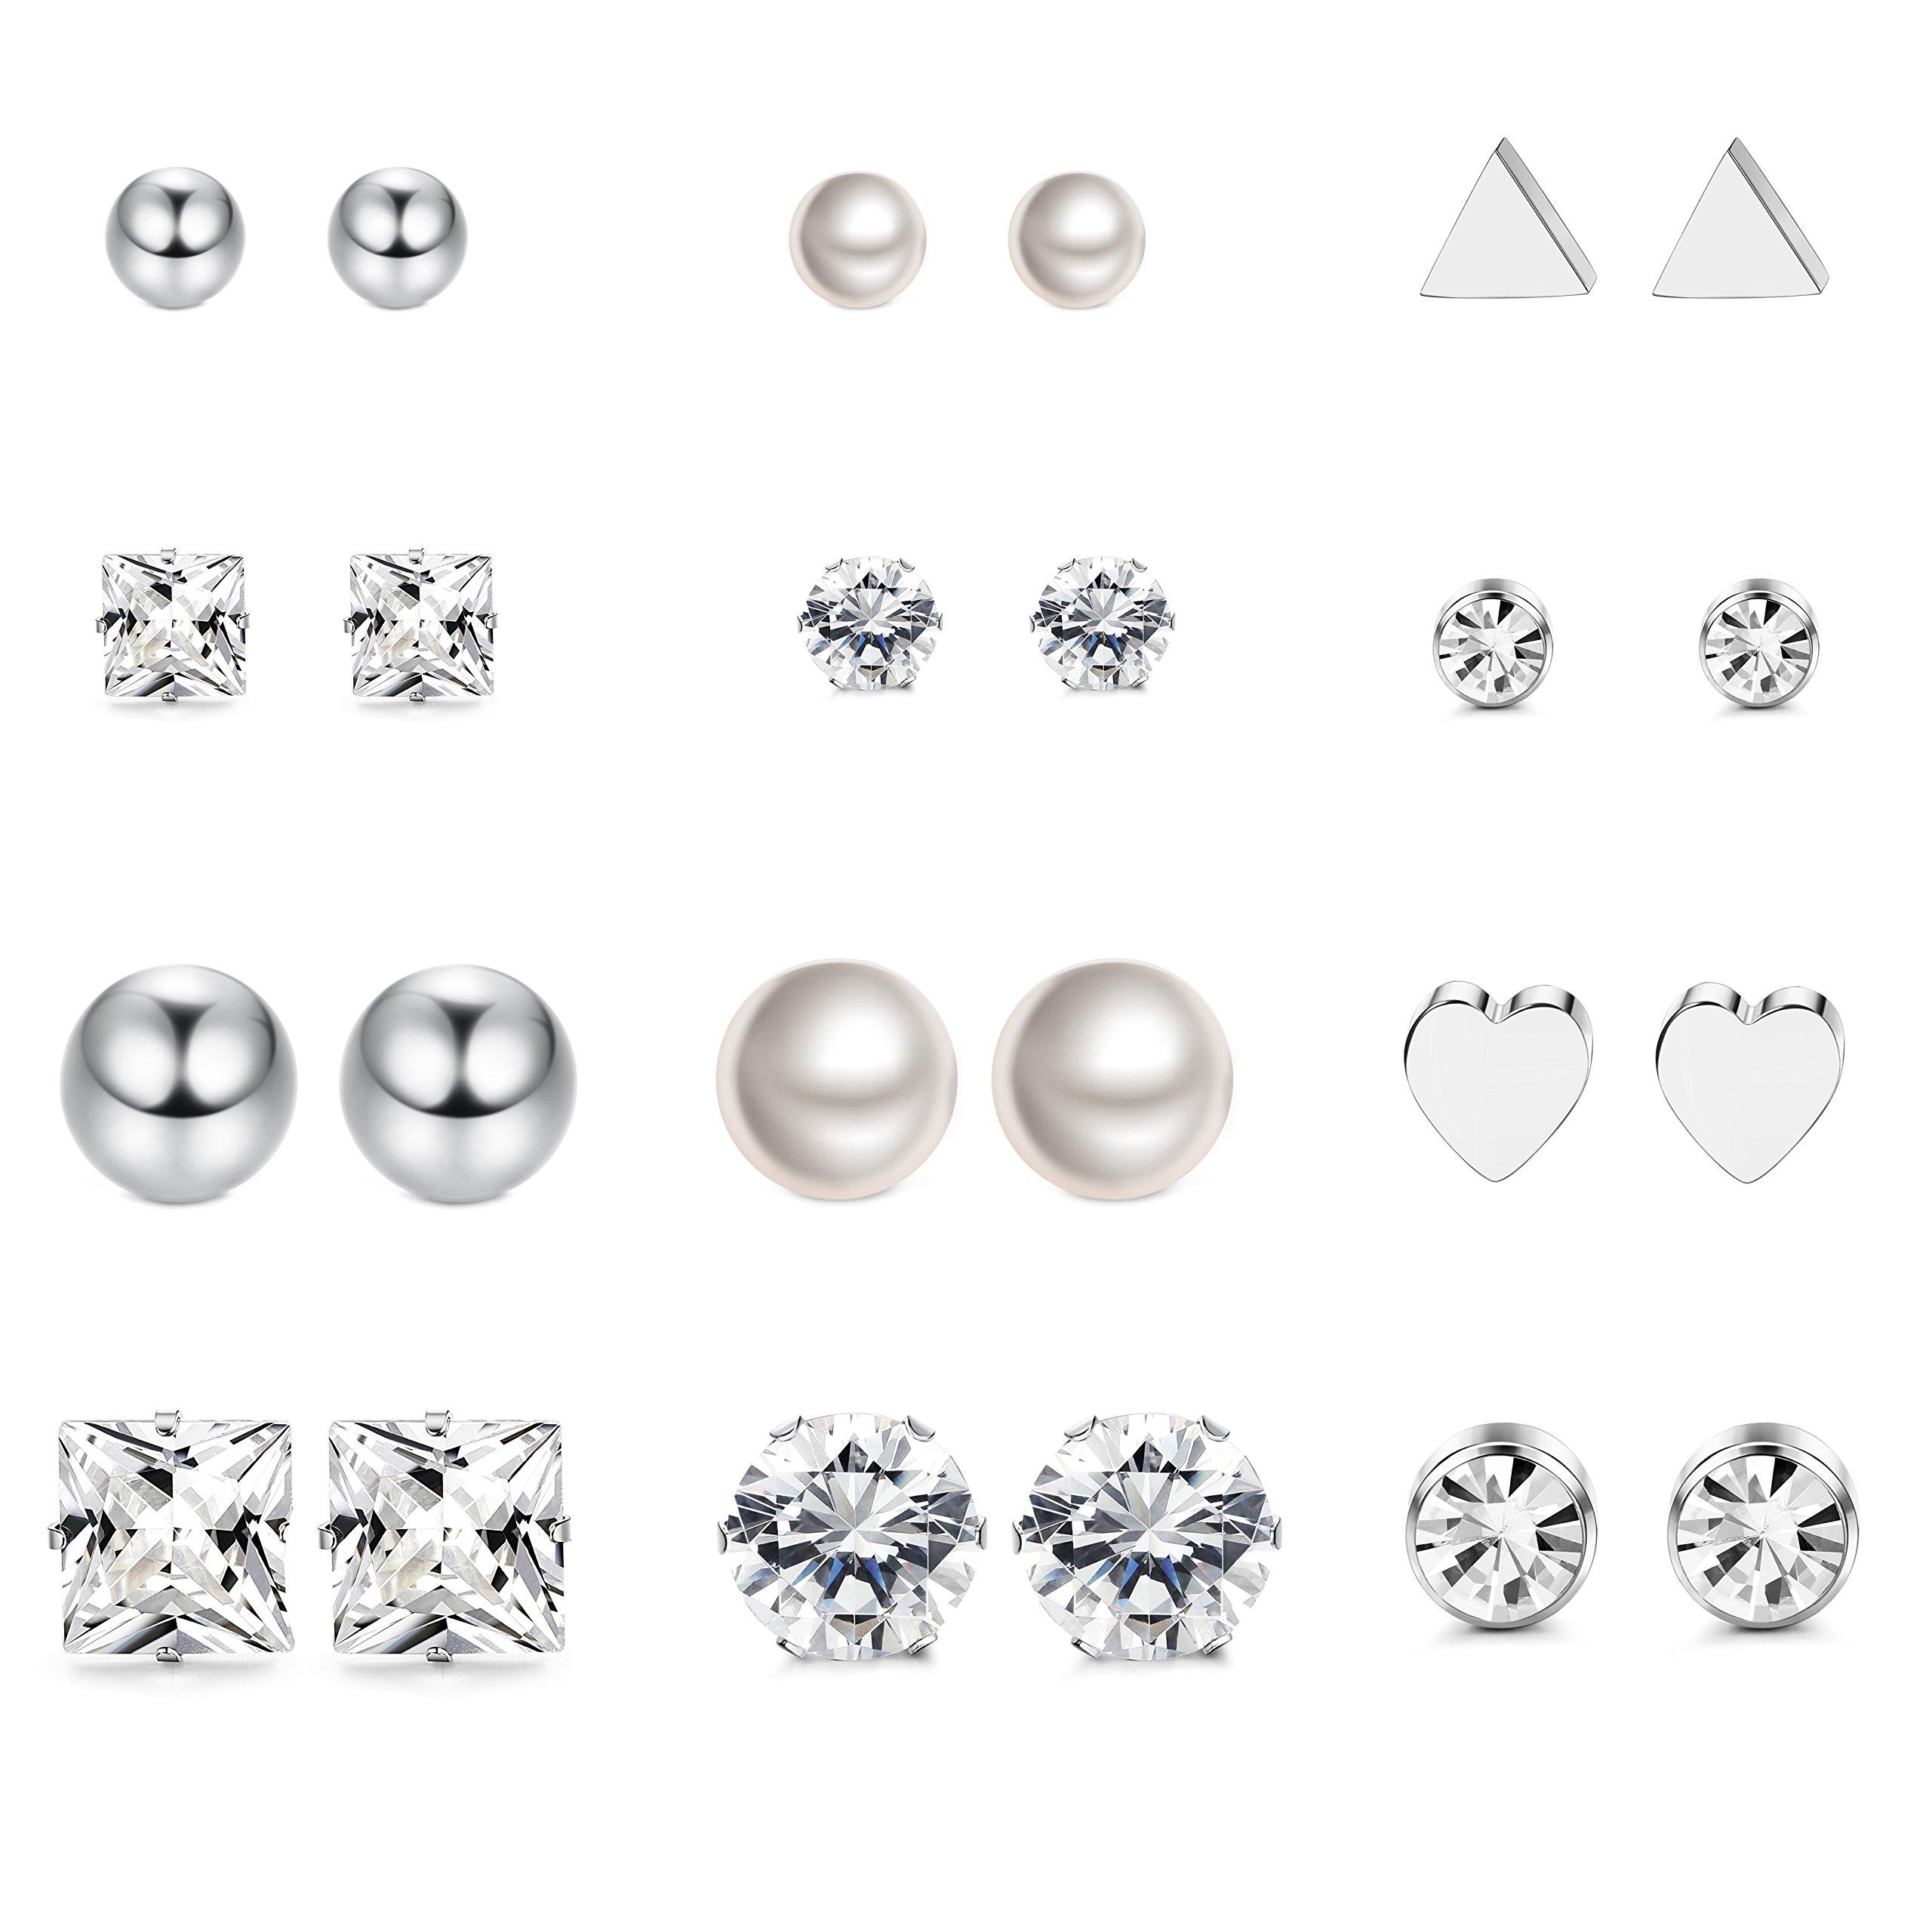 LOYALLOOK 12 Pairs Stainless Steel Earrings Stud Earrings Set for Womens Girls Clear CZ Stud